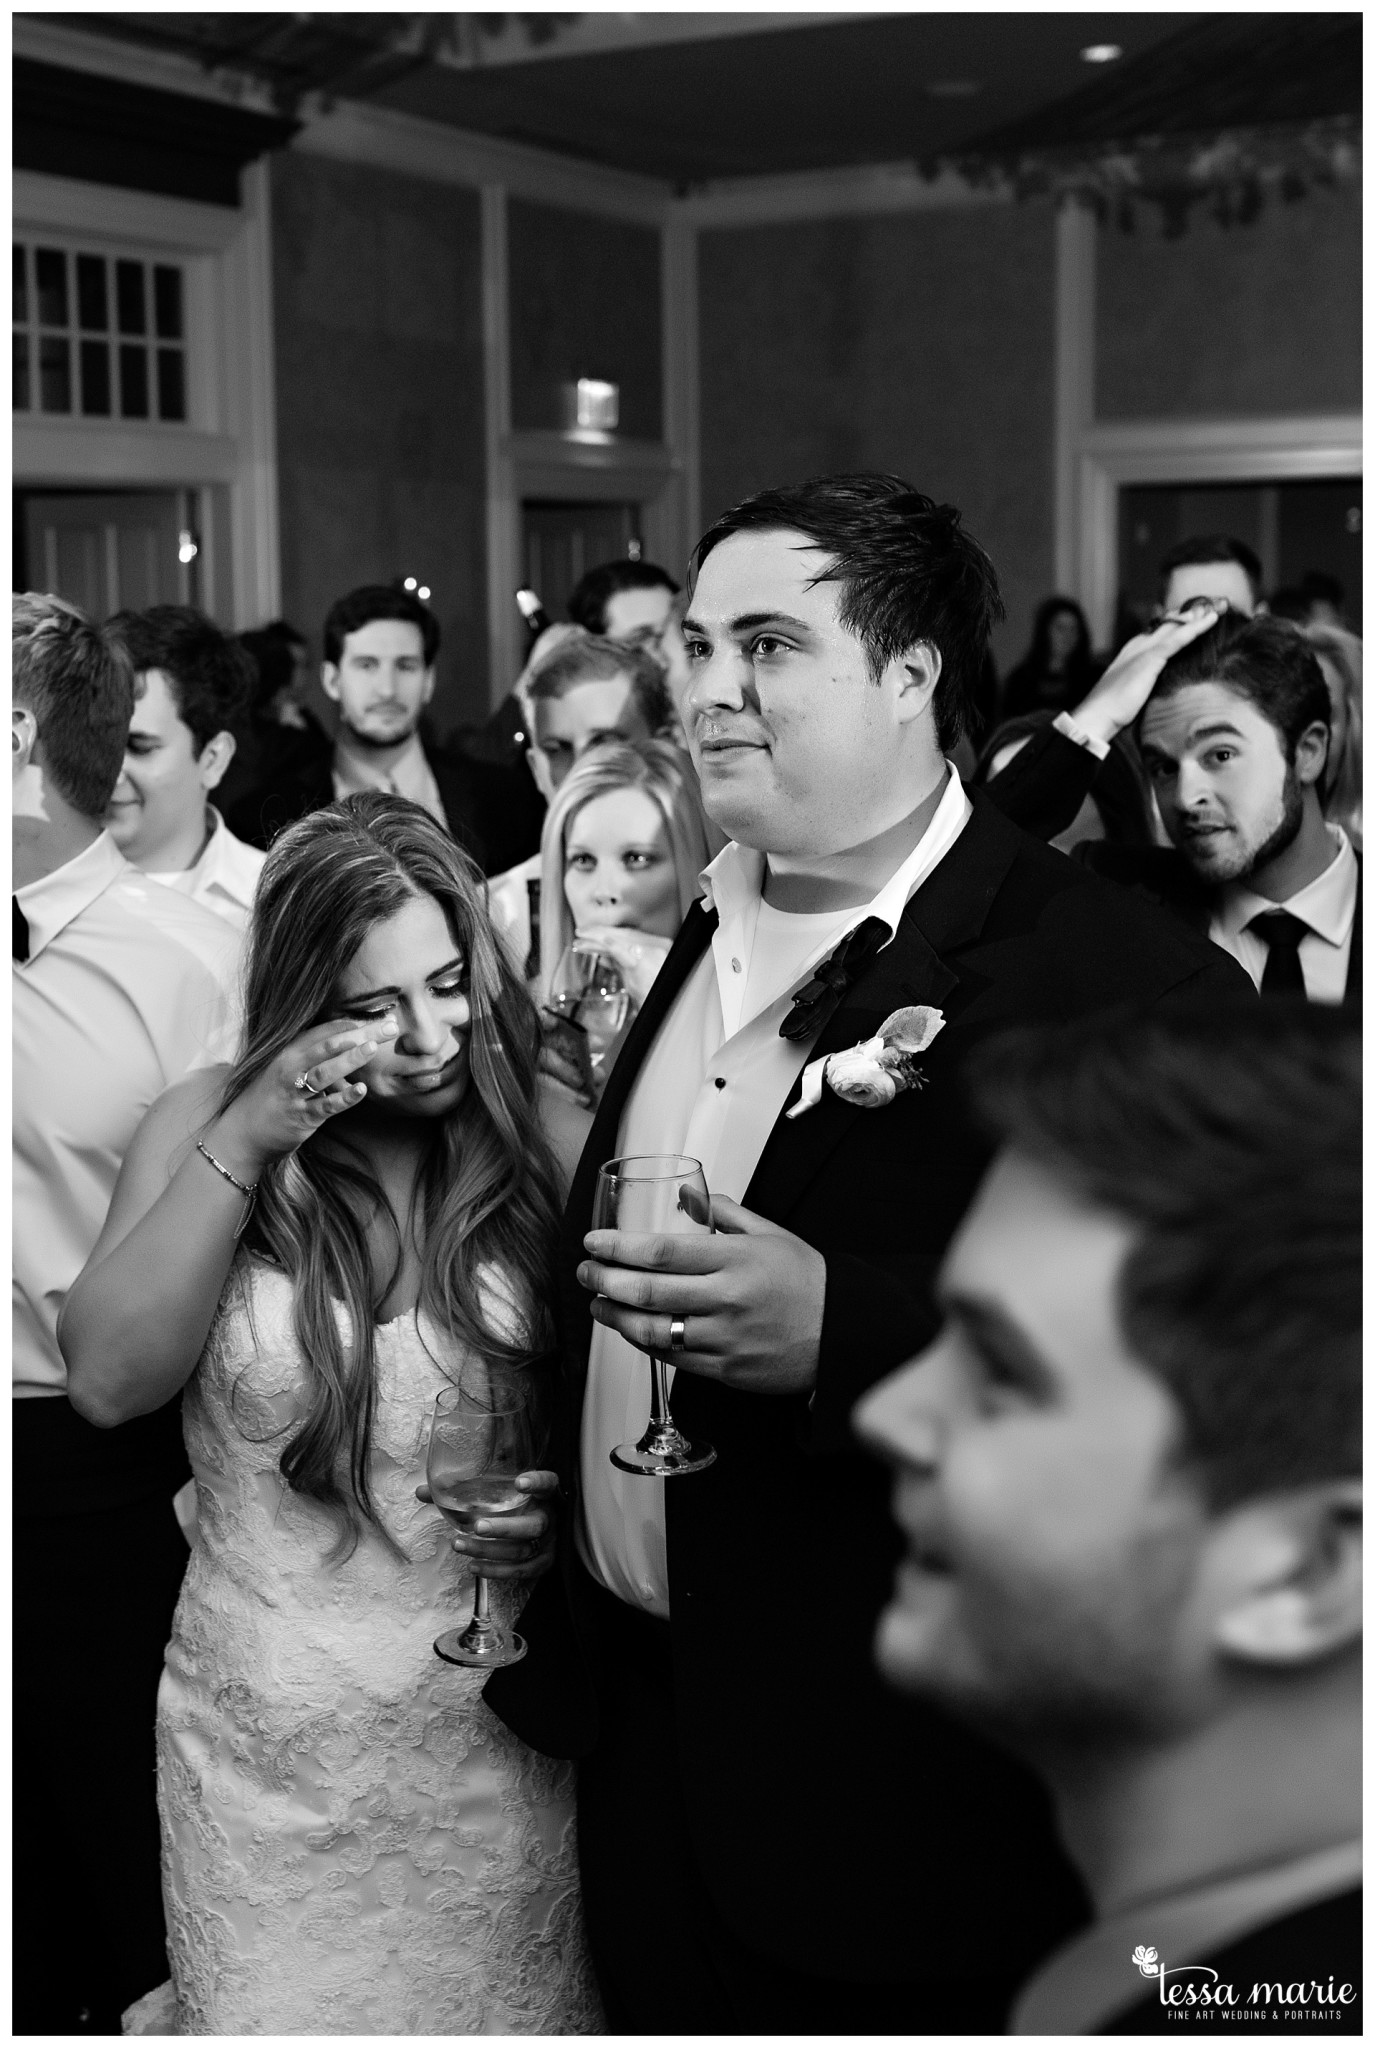 tessa_marie_weddings_legacy_story_focused_wedding_pictures_atlanta_wedding_photographer_0159